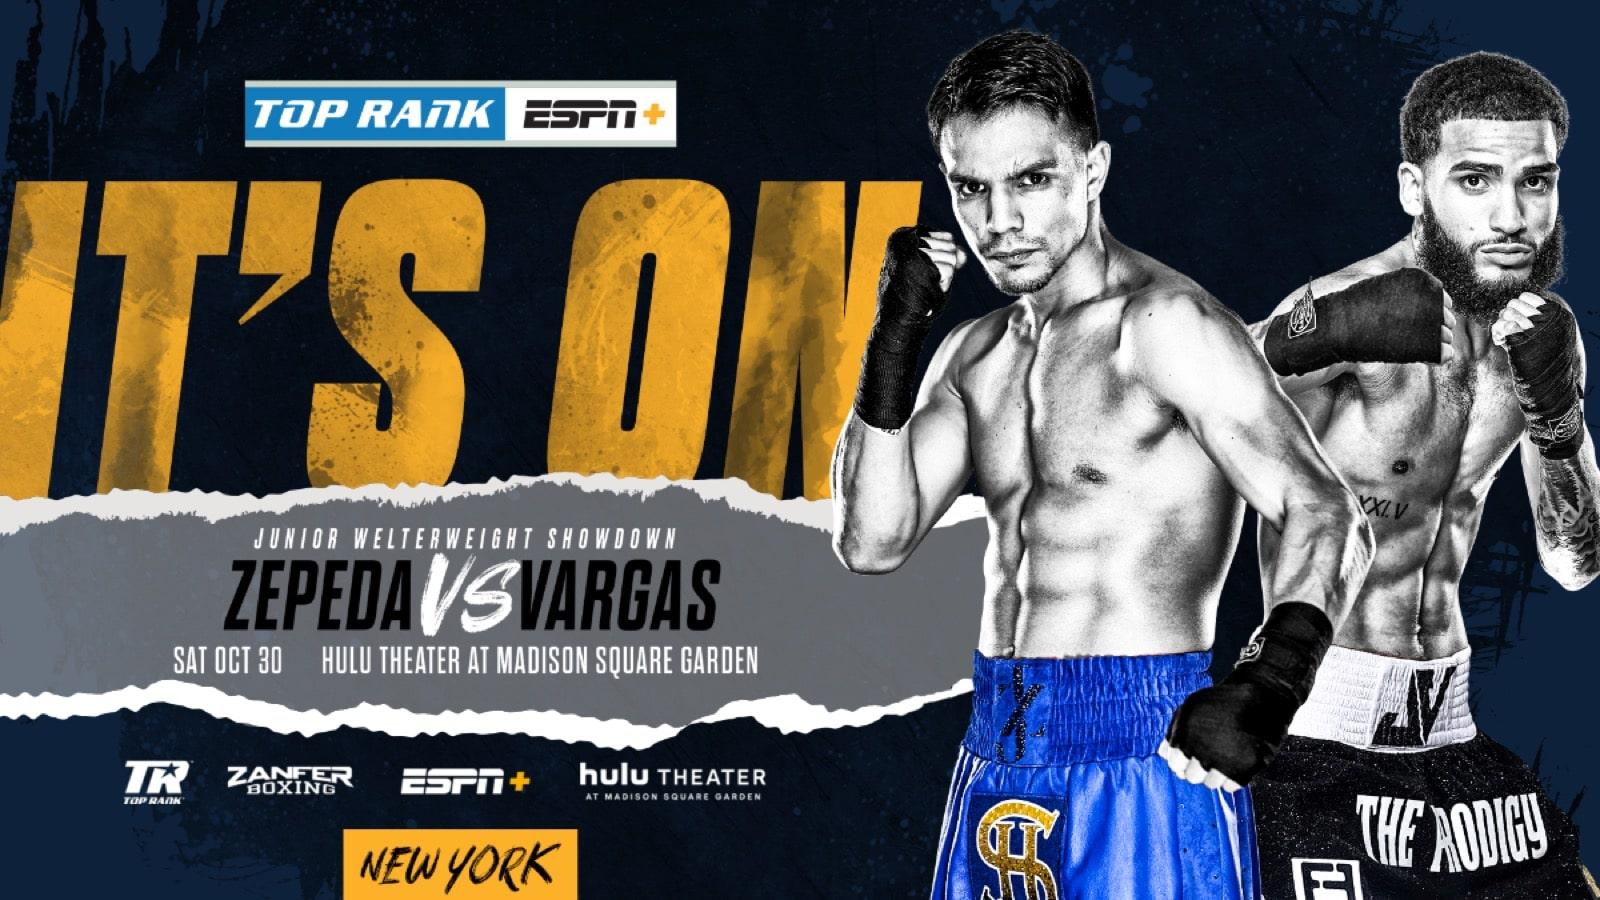 Zepeda vs Vargas - ESPN+ -Oct. 30 - 10 pm ET